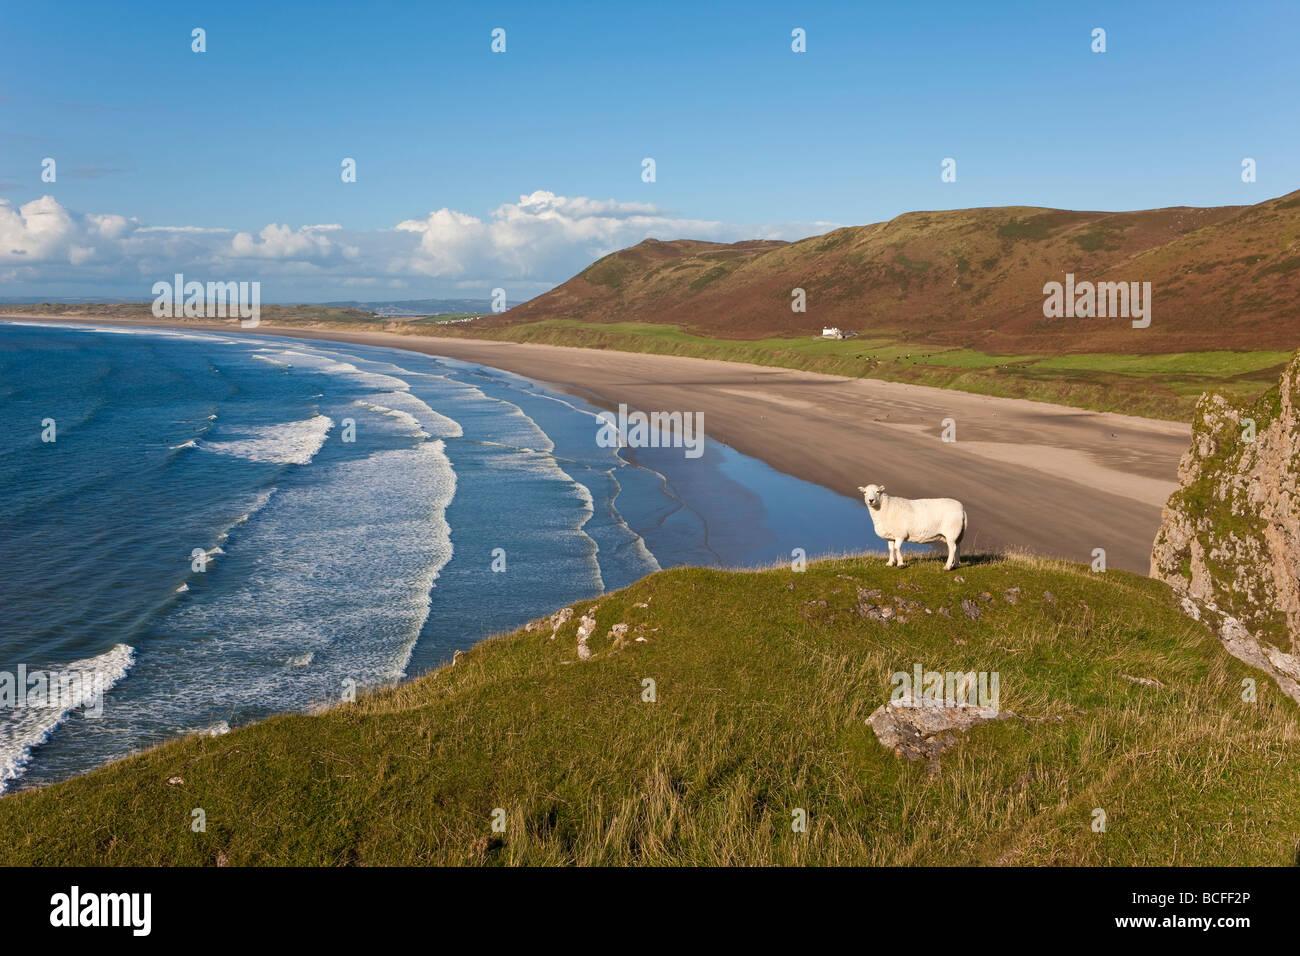 UK, Wales, Glamorgan, Gower Peninsula, Rhossilli Bay - Stock Image